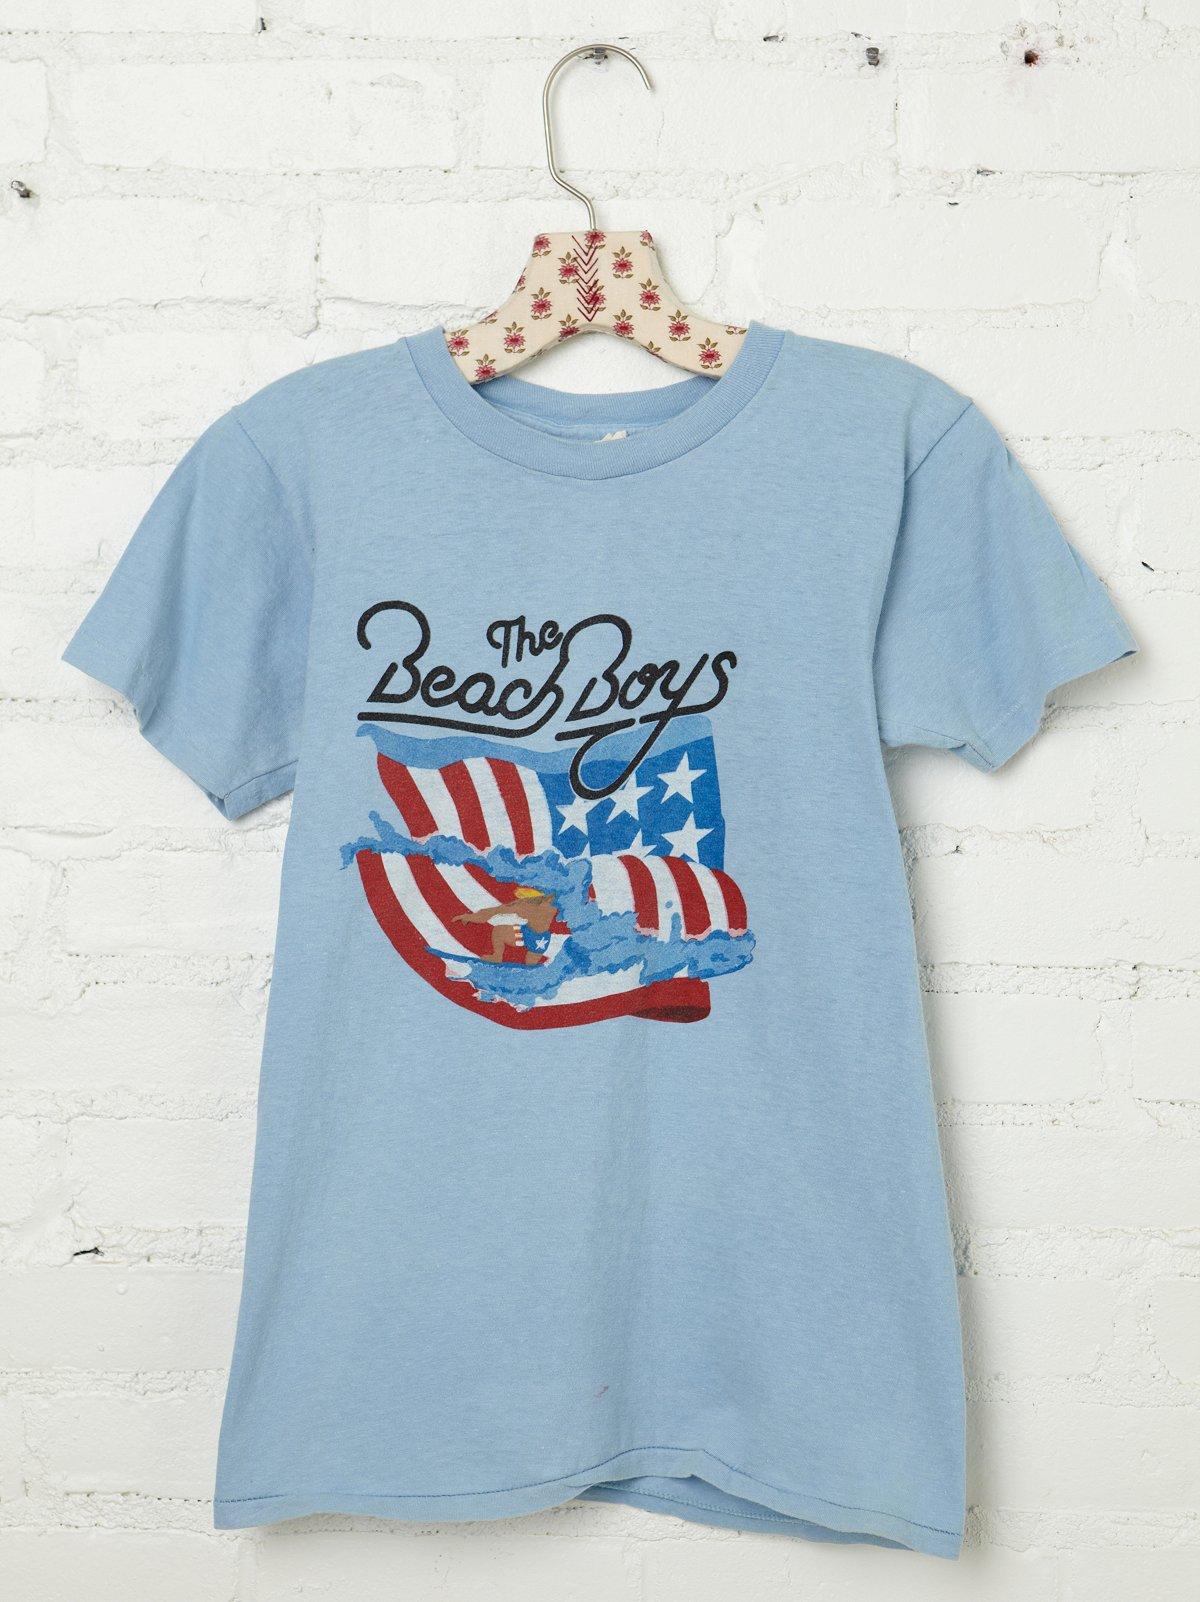 Vintage 1981 Beach Boys Tee